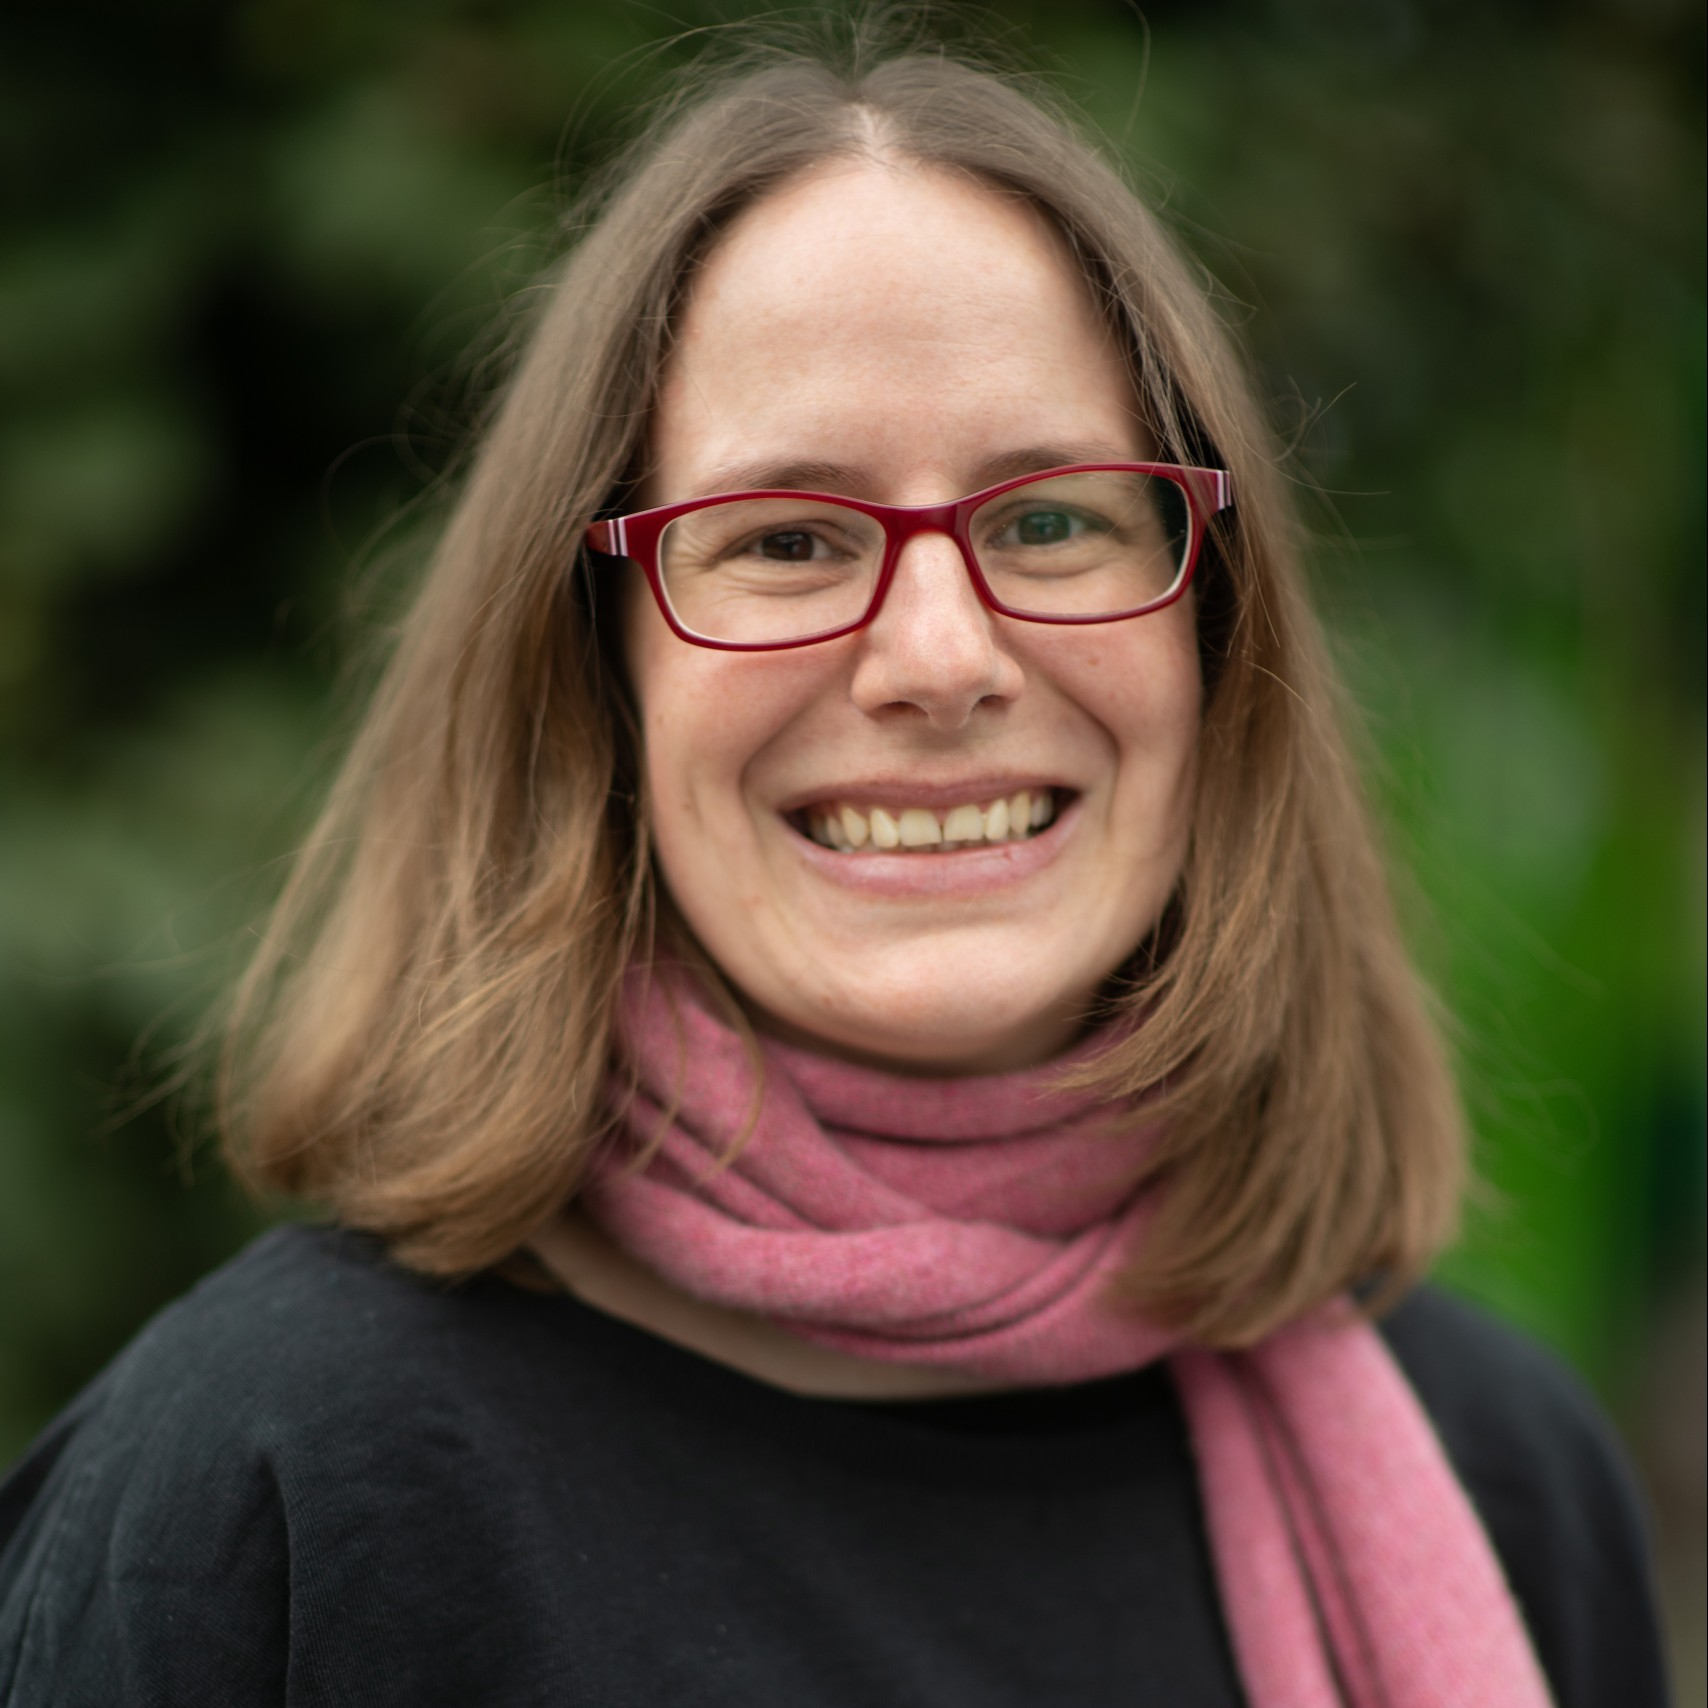 Sarah Jermutus